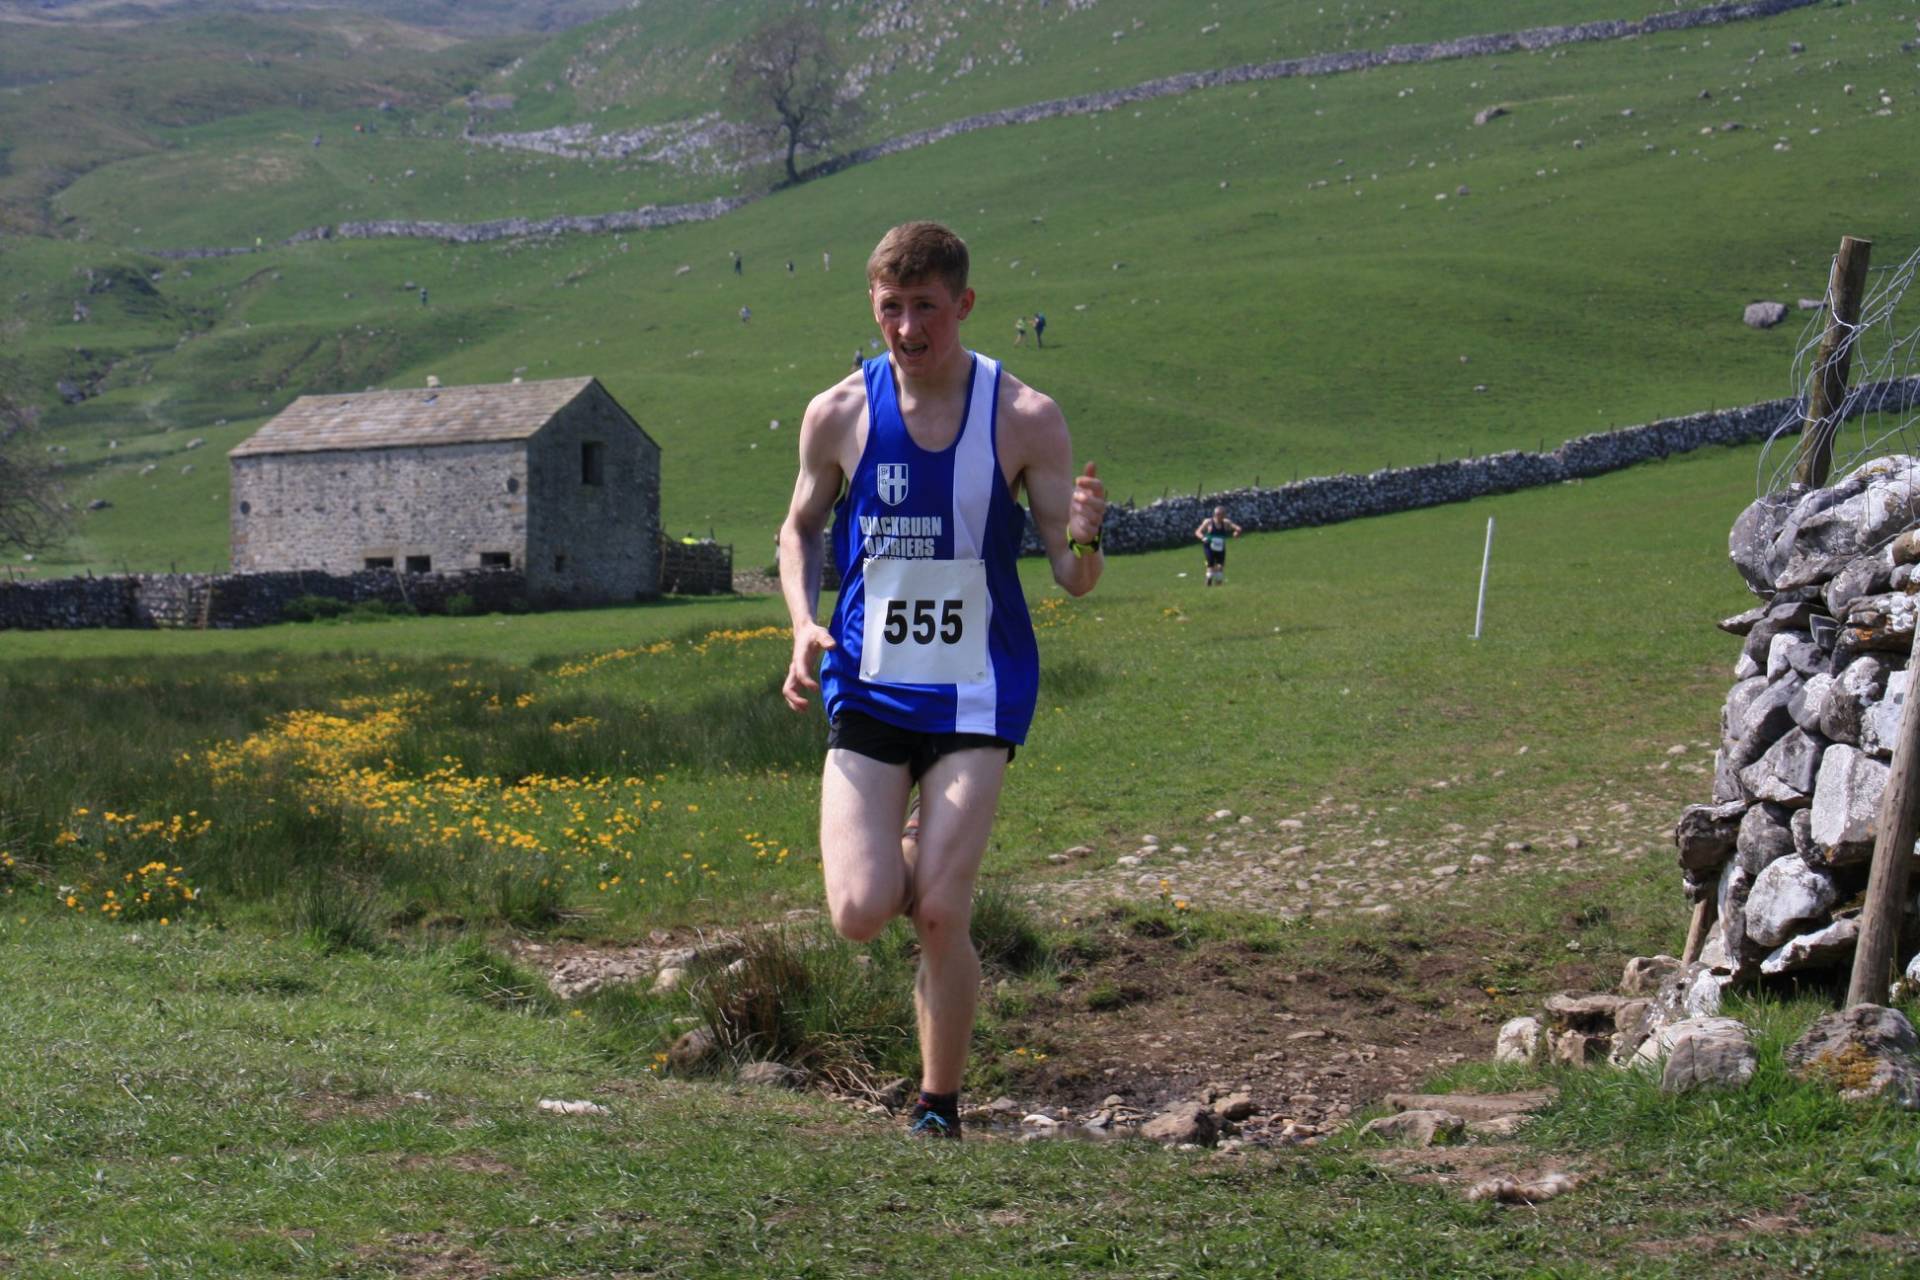 Ben Wins Wesham Summer 10k – Thomas 2nd at Malham – Top Ten for John at Harrock Hill Race – Becky at Cheshire Sprint Triathlon